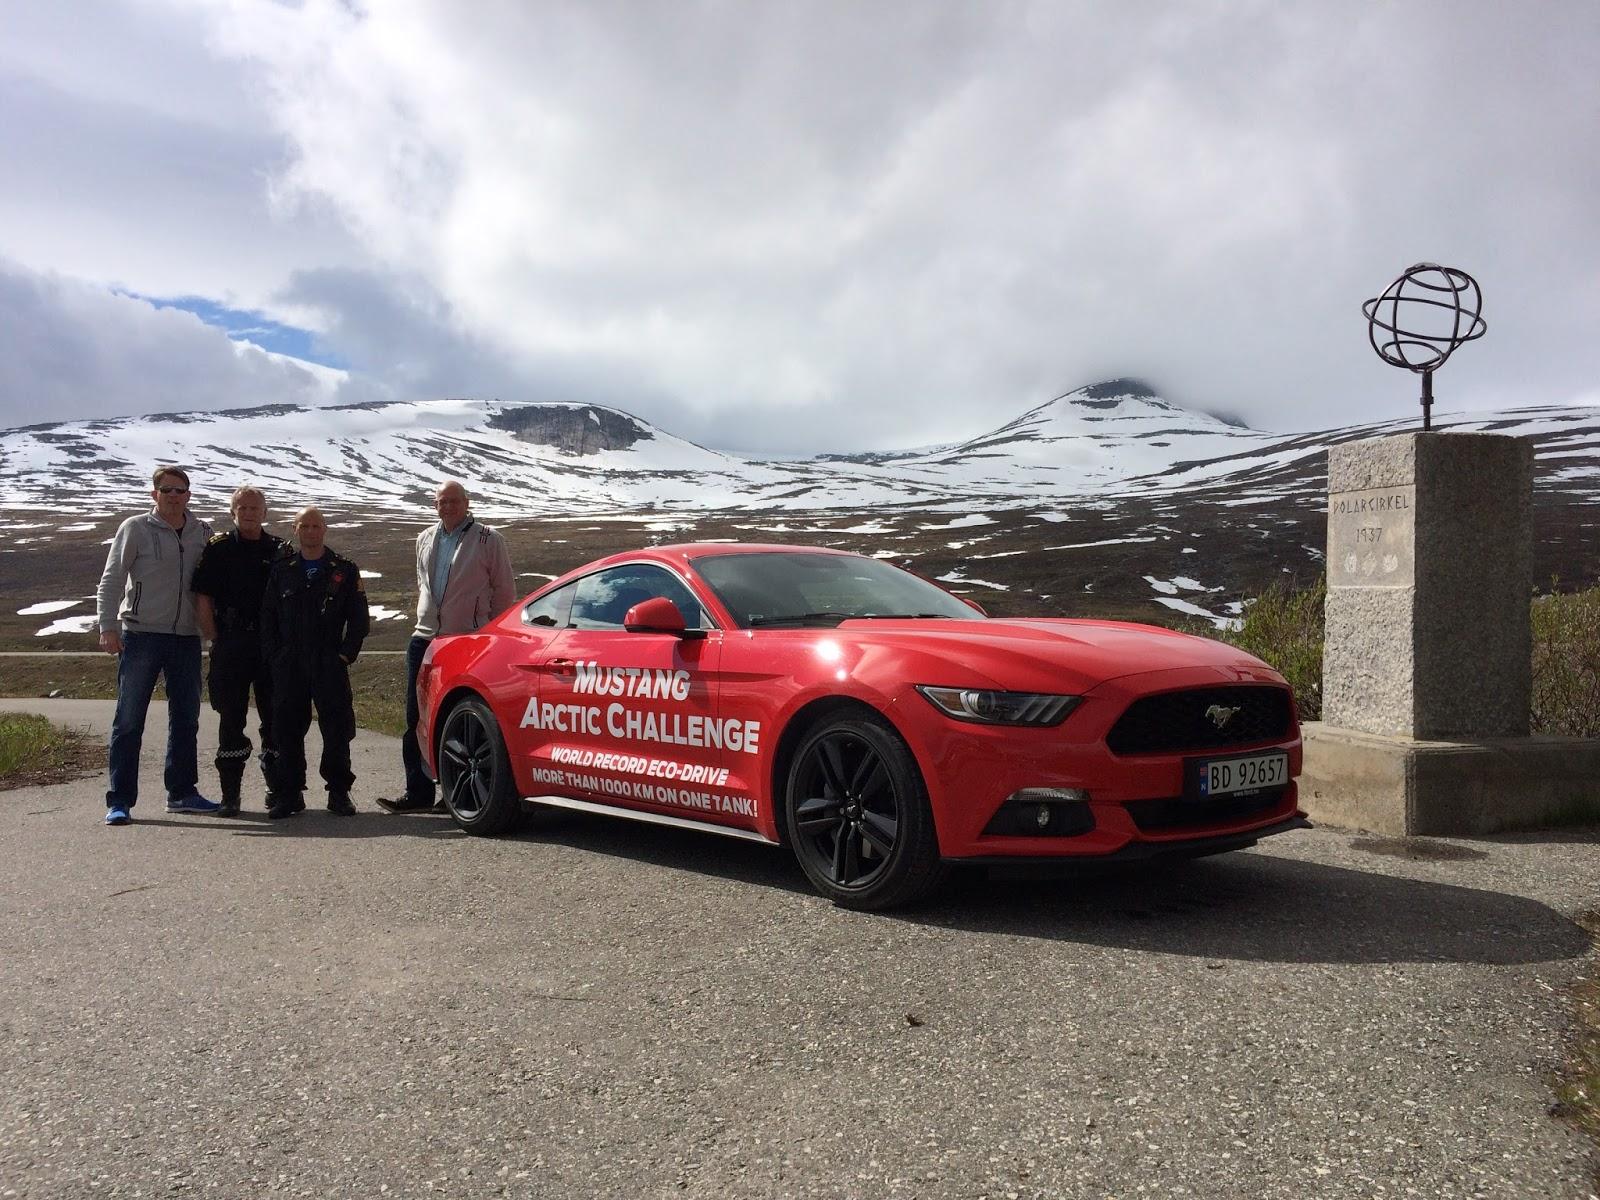 IMG 33632B252822529 Σούπερ εγκρατής οδηγός μιας Mustang, έκανε 1250 χιλιόμετρα με ένα ρεζερβουάρ! Ford, Ford Mustang, Ρεκόρ